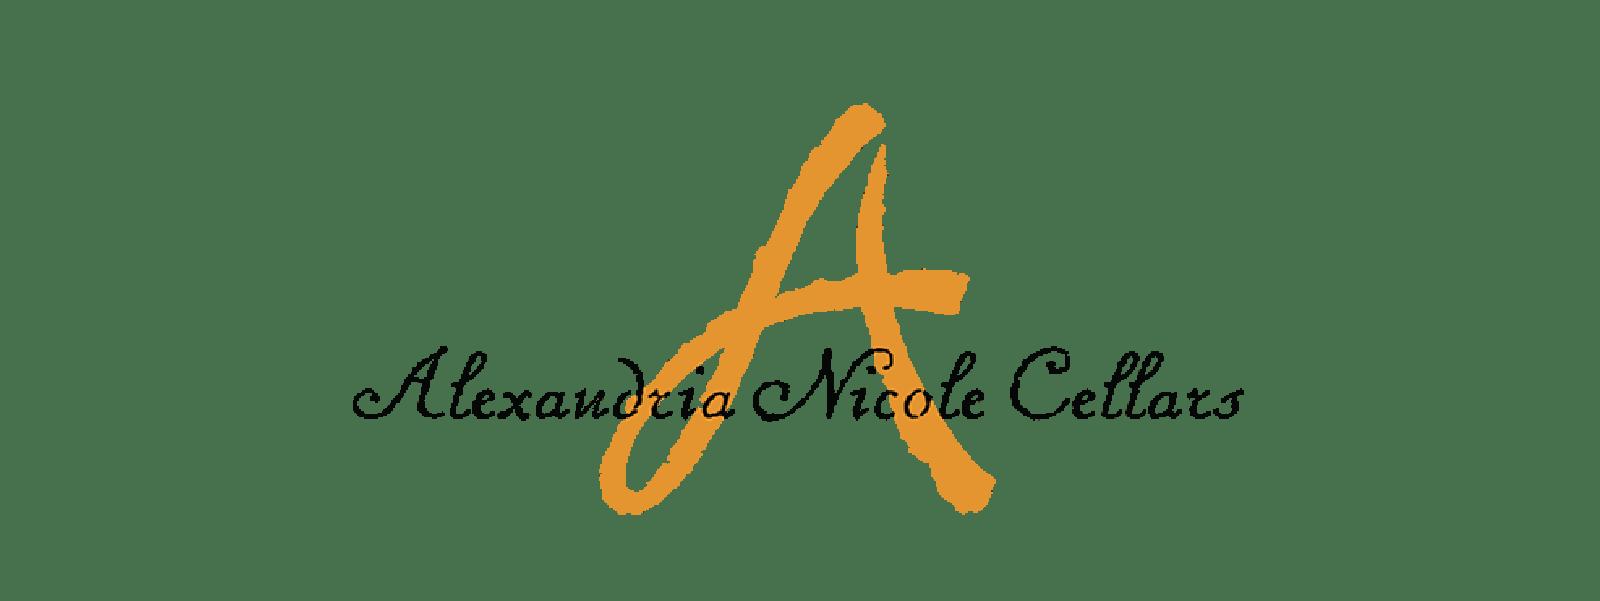 Alexandria Nicole Cellars logo